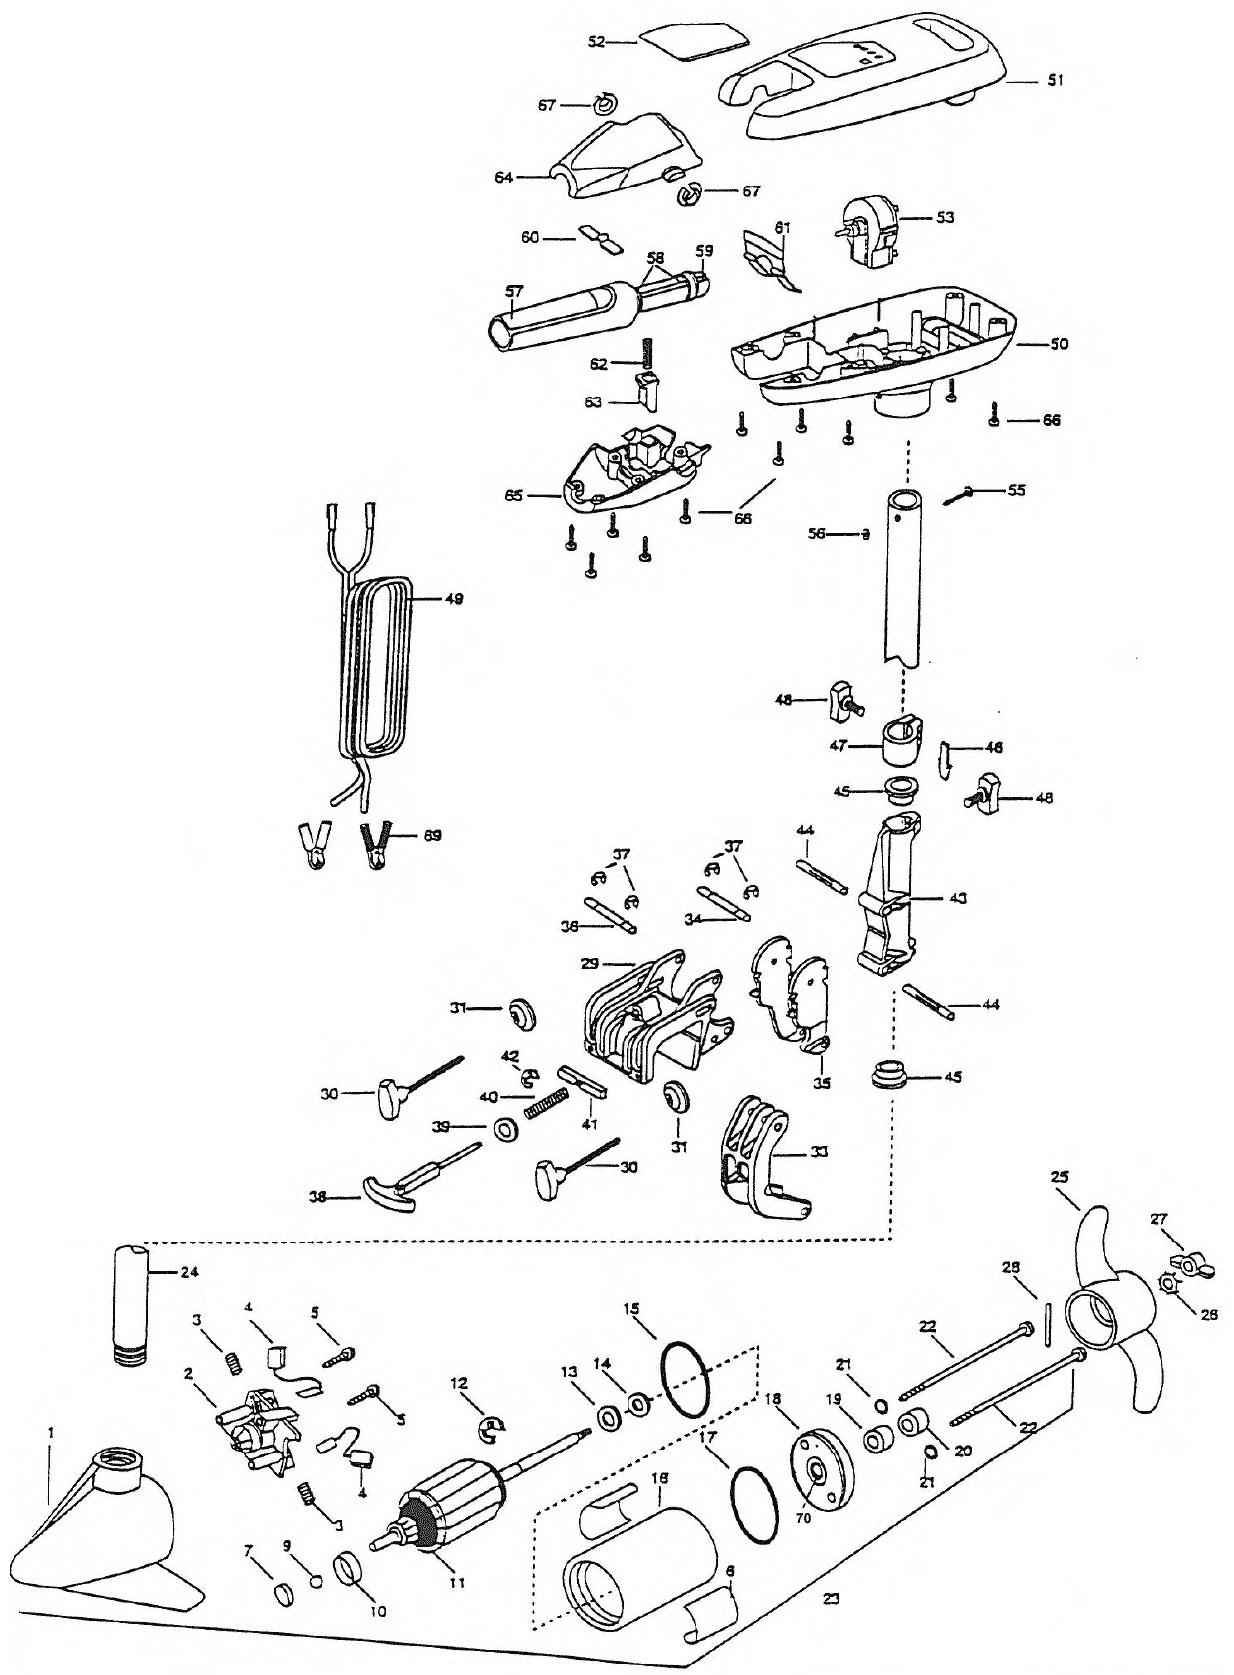 Minn Kota Turbo Pro 42 At Manual Briggs And Stratton 60500 Series Parts List Diagram Endura 30 Array Rh